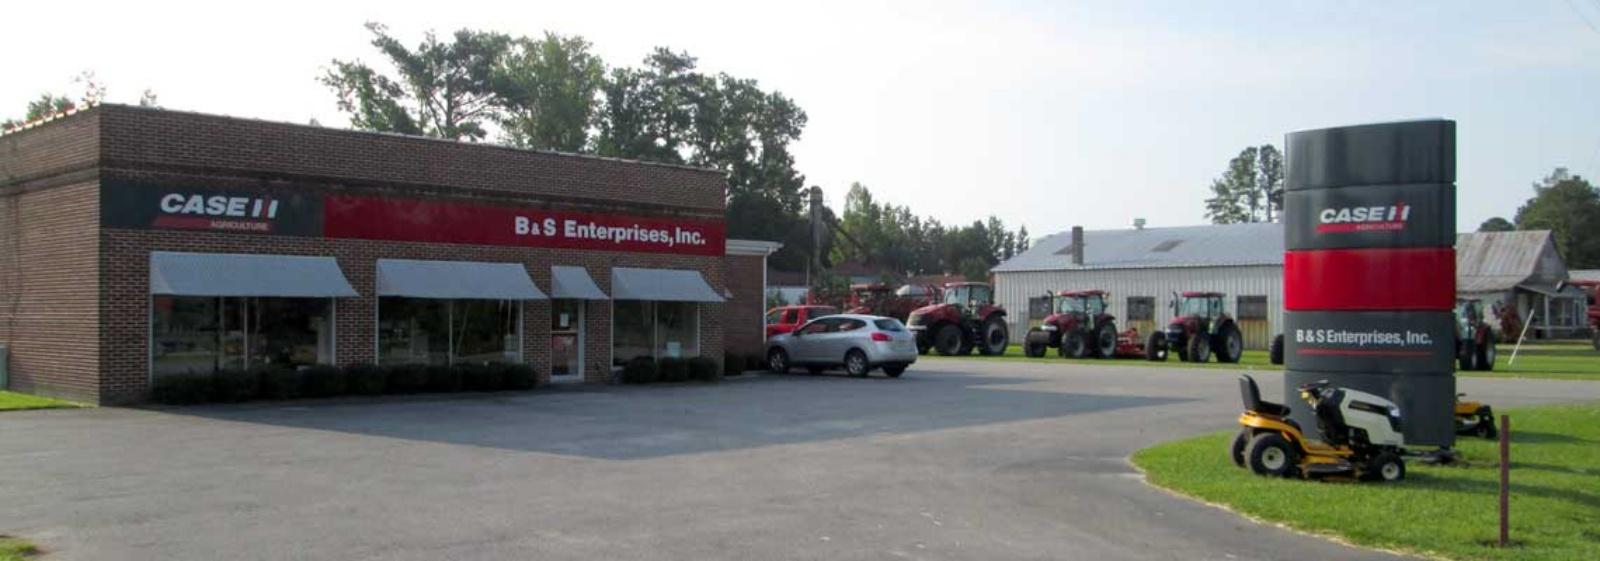 B & S Enterprises